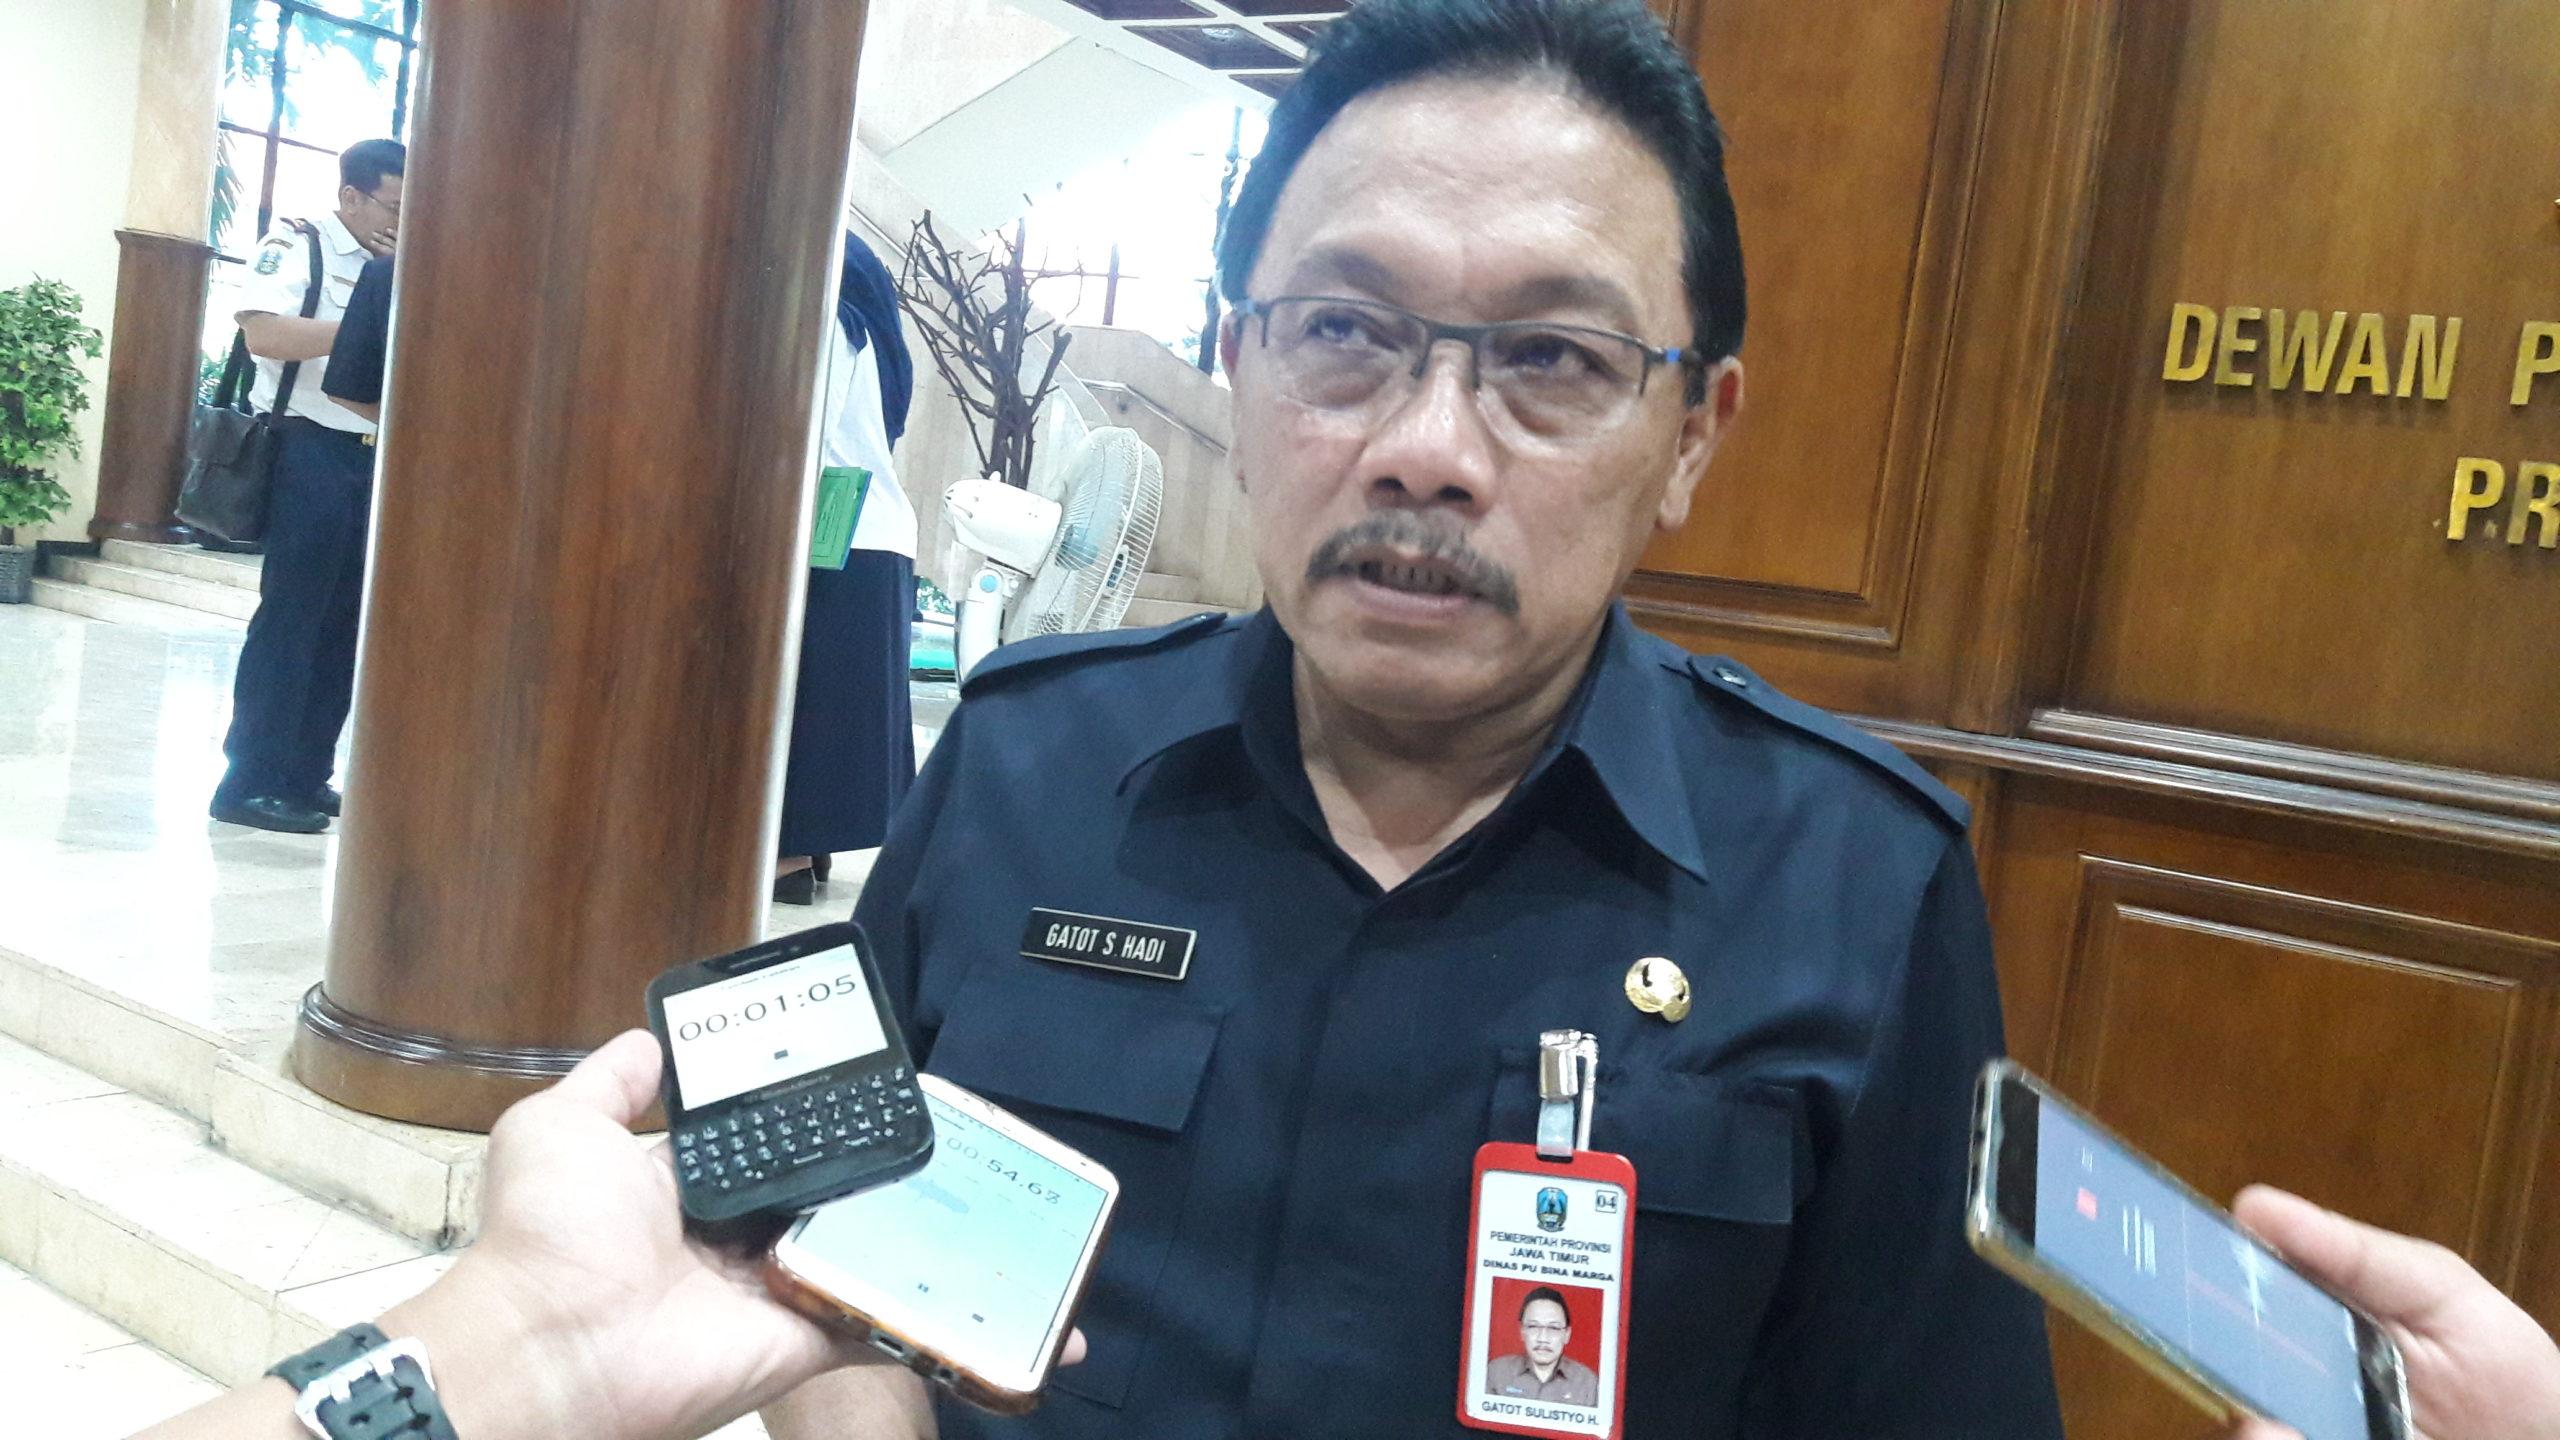 Kepala Dinas Bina Marga Gatot Sulityo Hadi setelah melakukan hearing dengan Komisi D DPRD Jatim diruang Badan Anggaran (Banggar) DPRD Jatim, Senin (24/ 02/20).